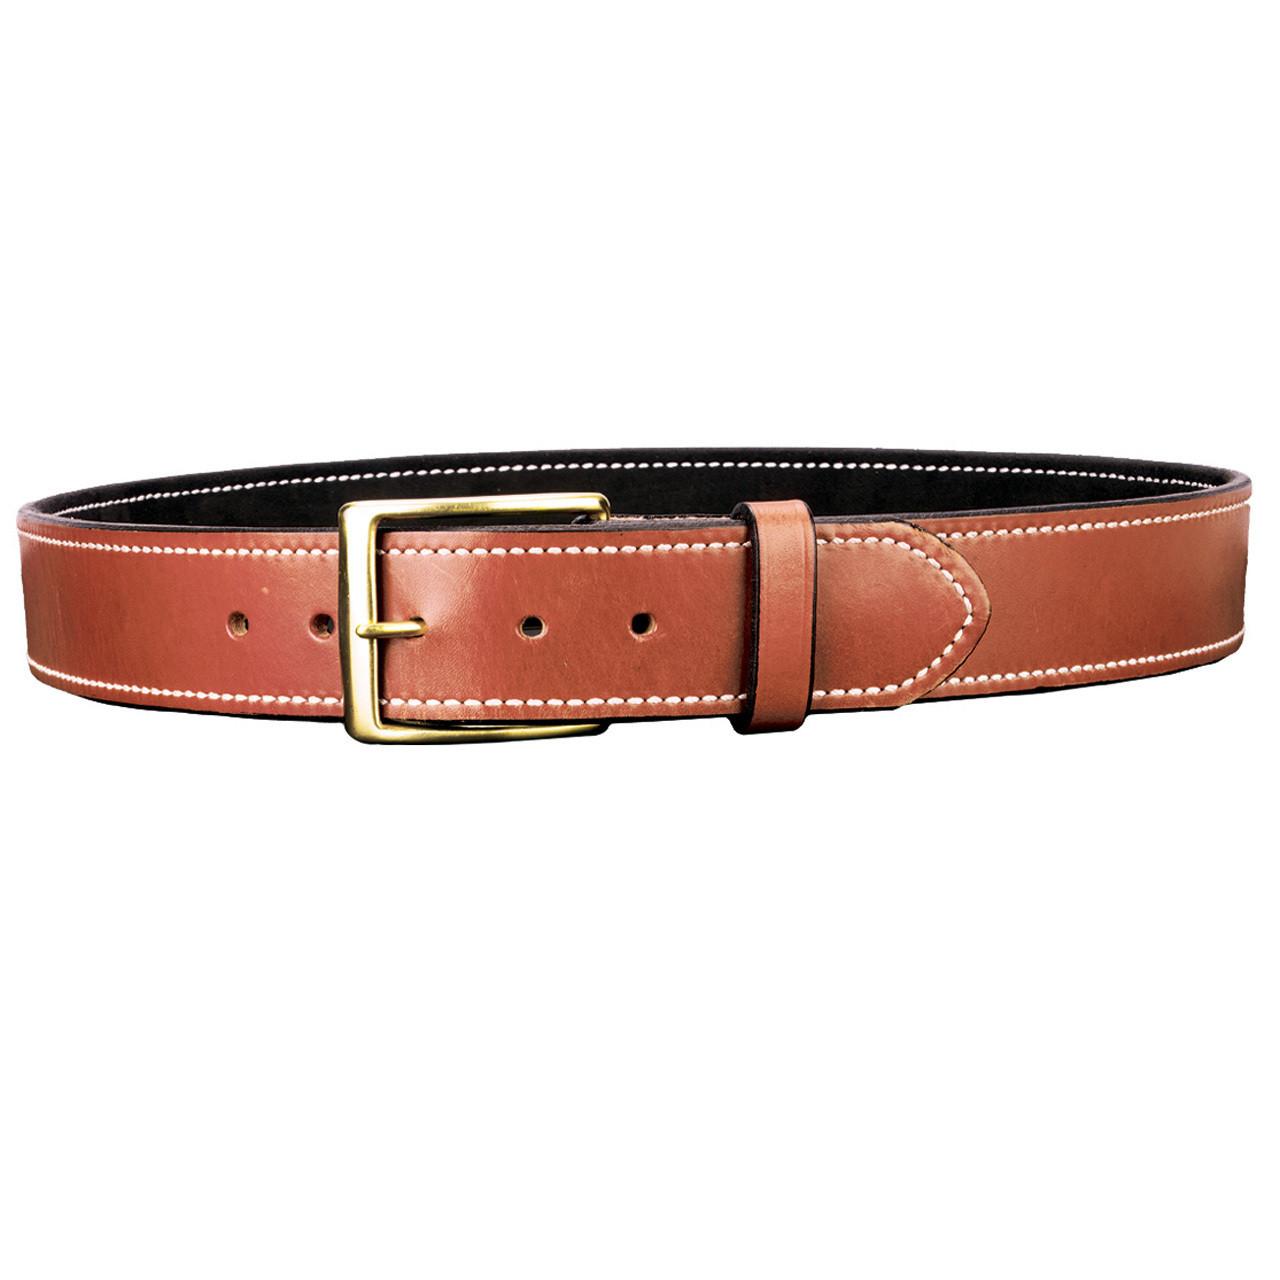 "1 3/4"" Belt"